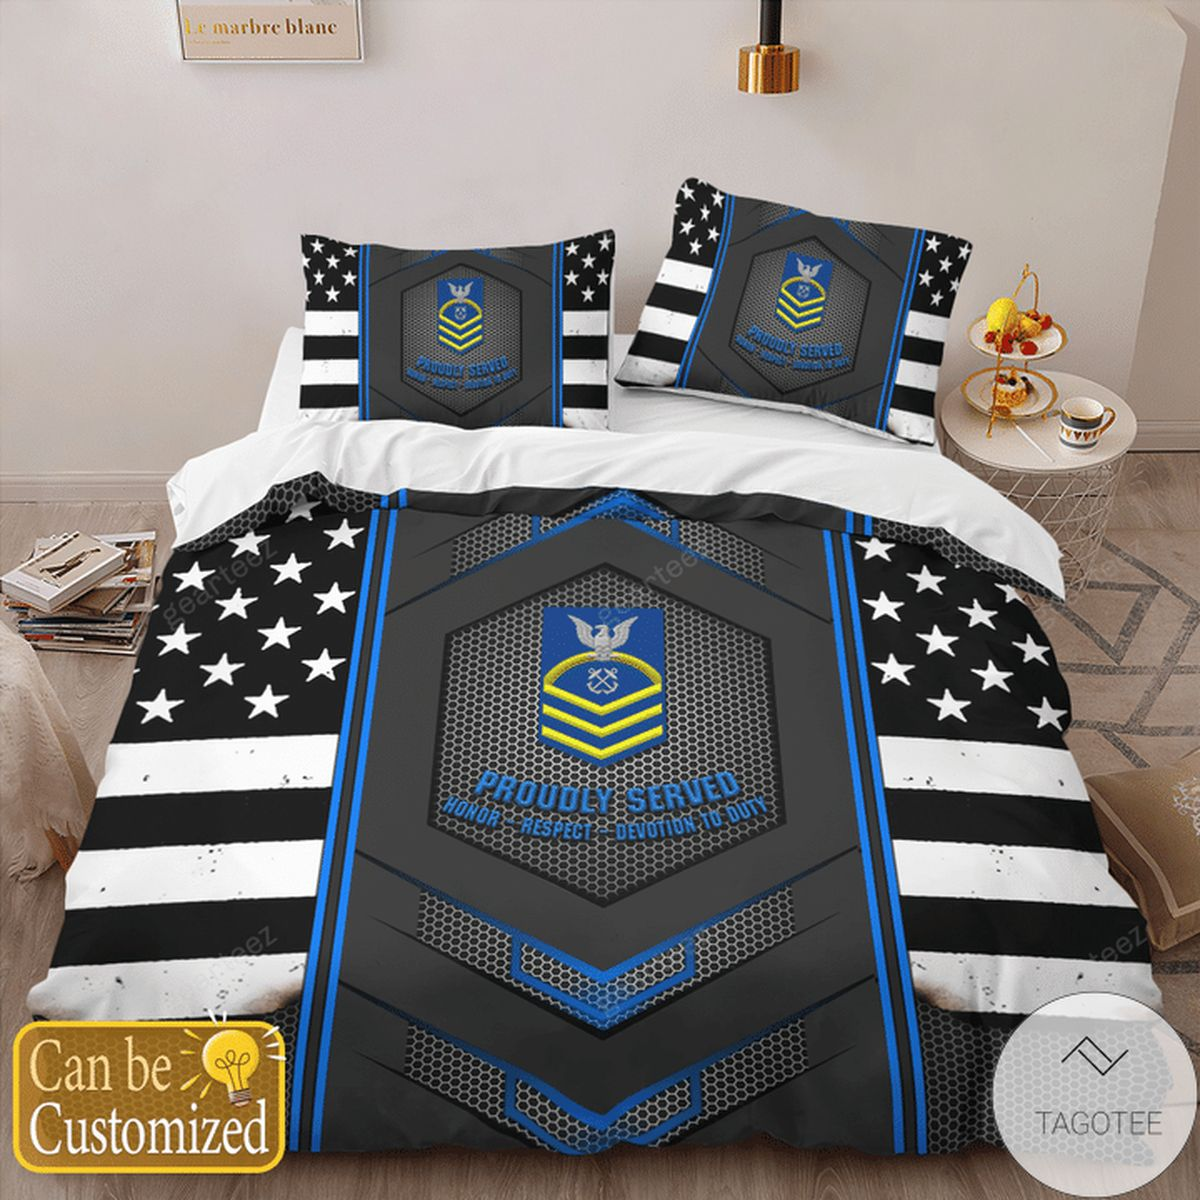 Personalized Custom Rank Proudly Served - Coast Guard Veteran Bedding Set